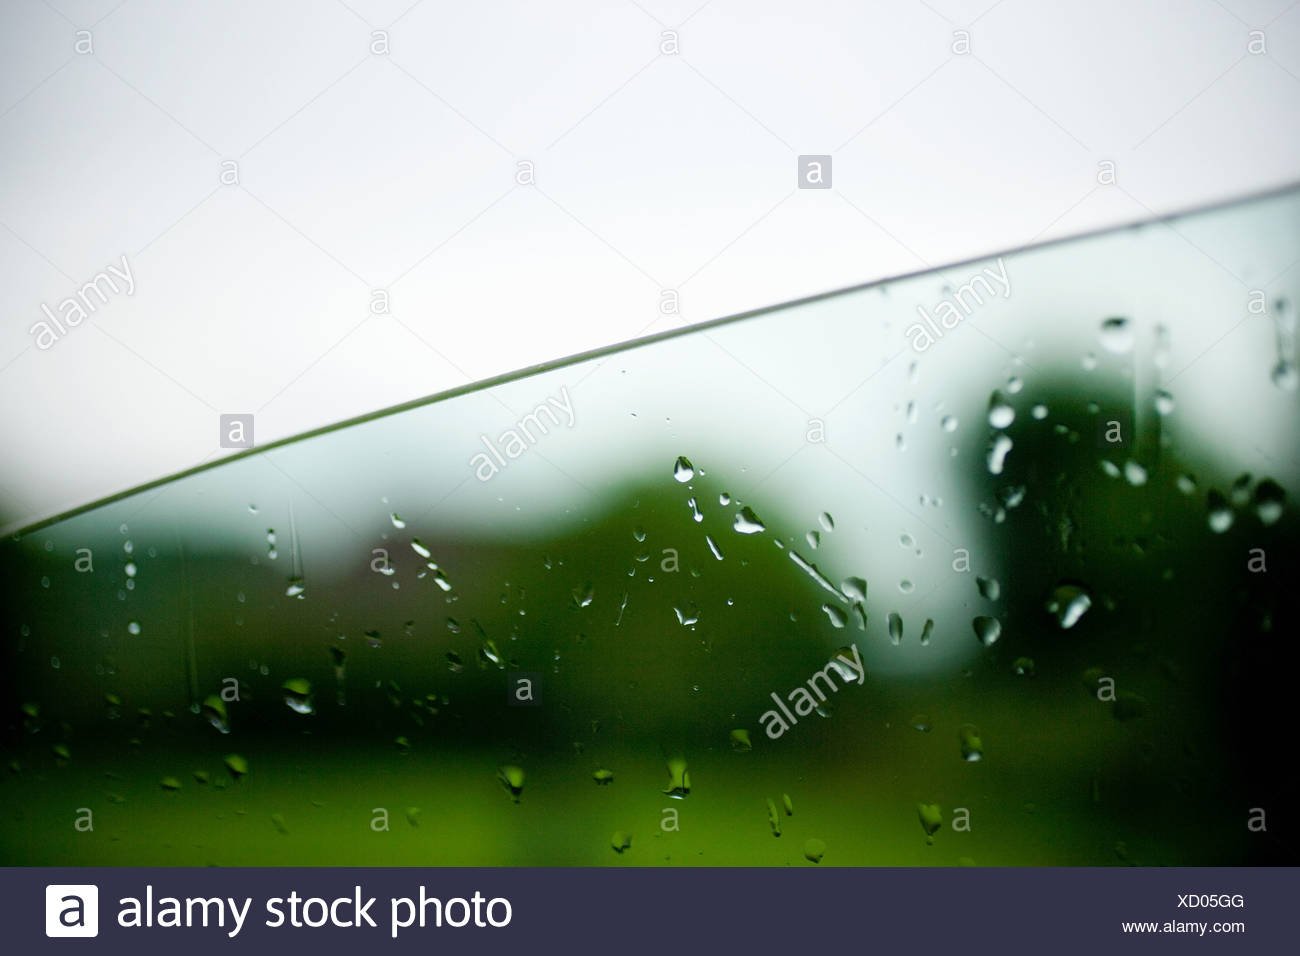 Las gotas de lluvia sobre la ventana de coche Imagen De Stock